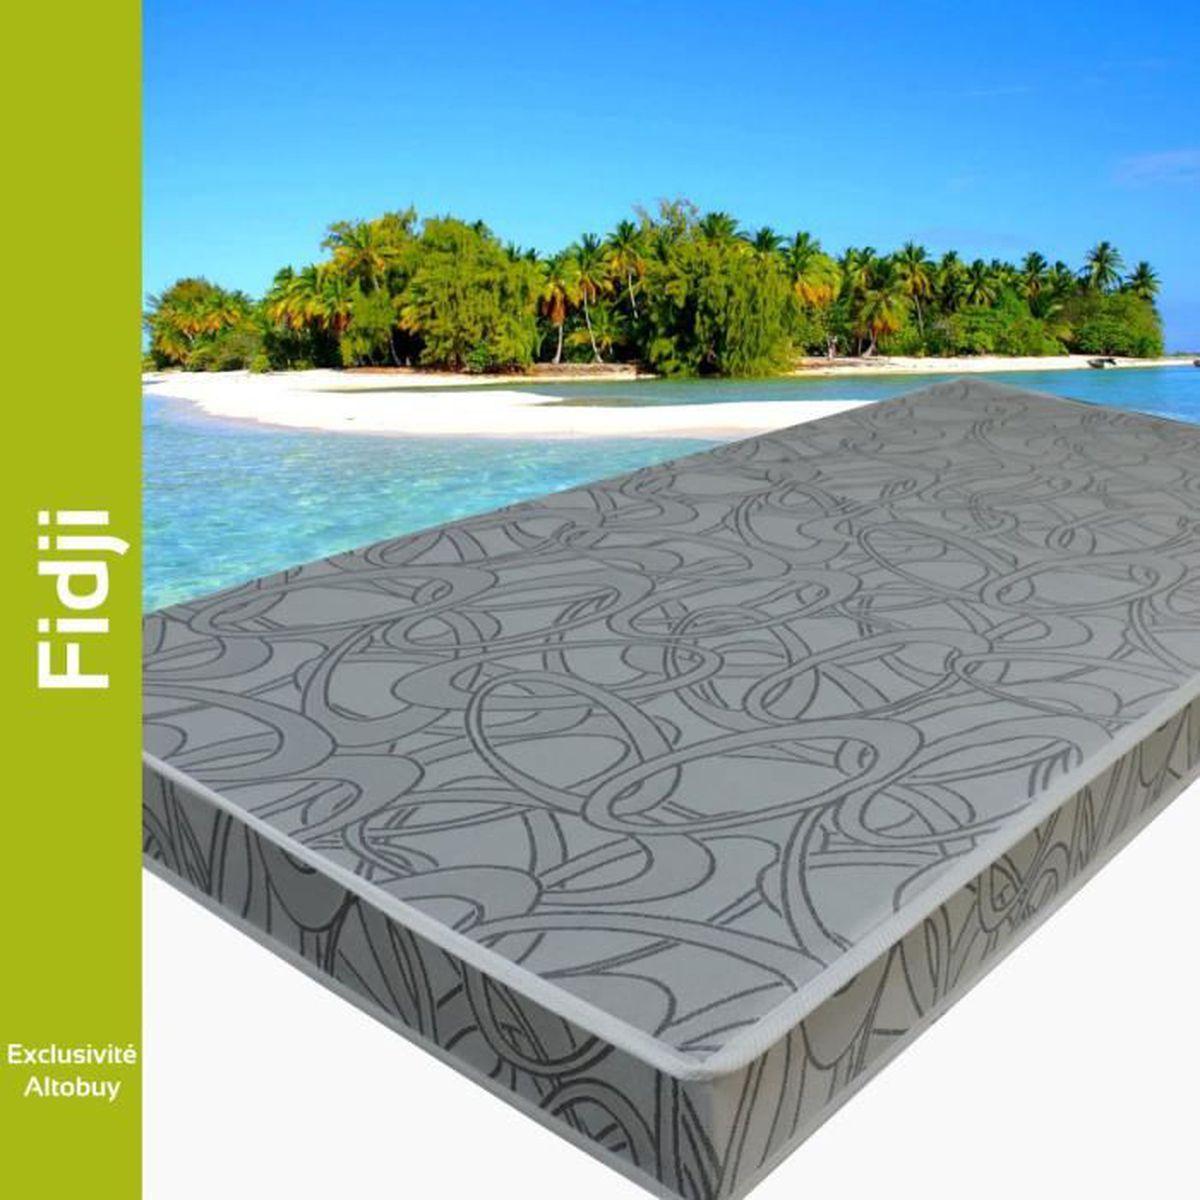 fidji matelas 80x190cm gris achat vente matelas. Black Bedroom Furniture Sets. Home Design Ideas